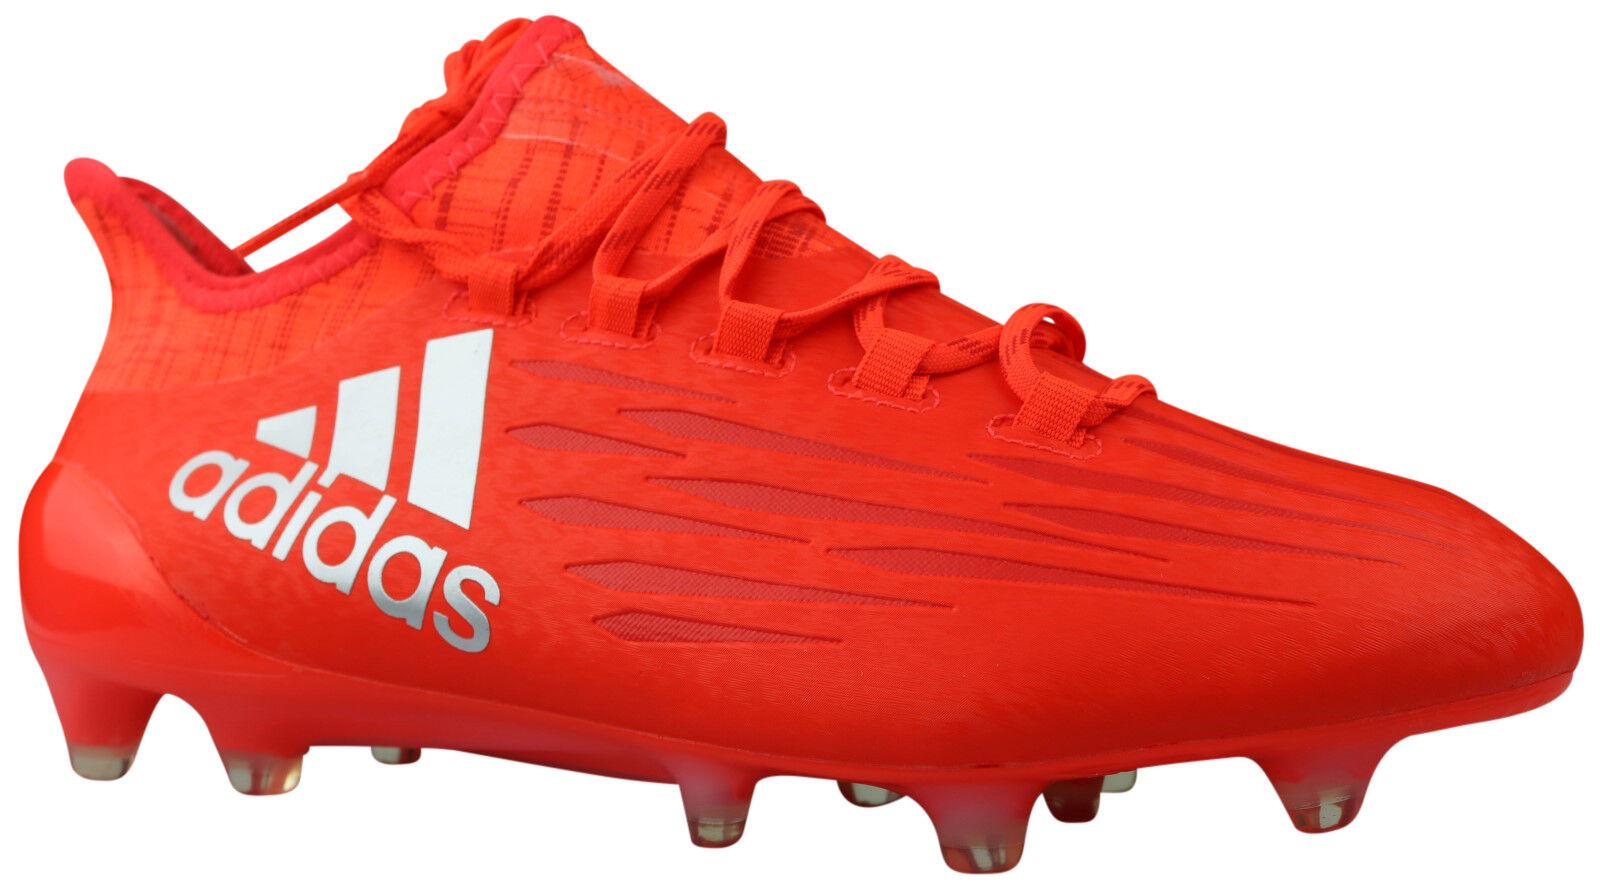 Adidas X 16.1 16.1 16.1 FG Fußballschuhe rot Nocken S81940 Gr. 40 NEU & OVP 2499cc